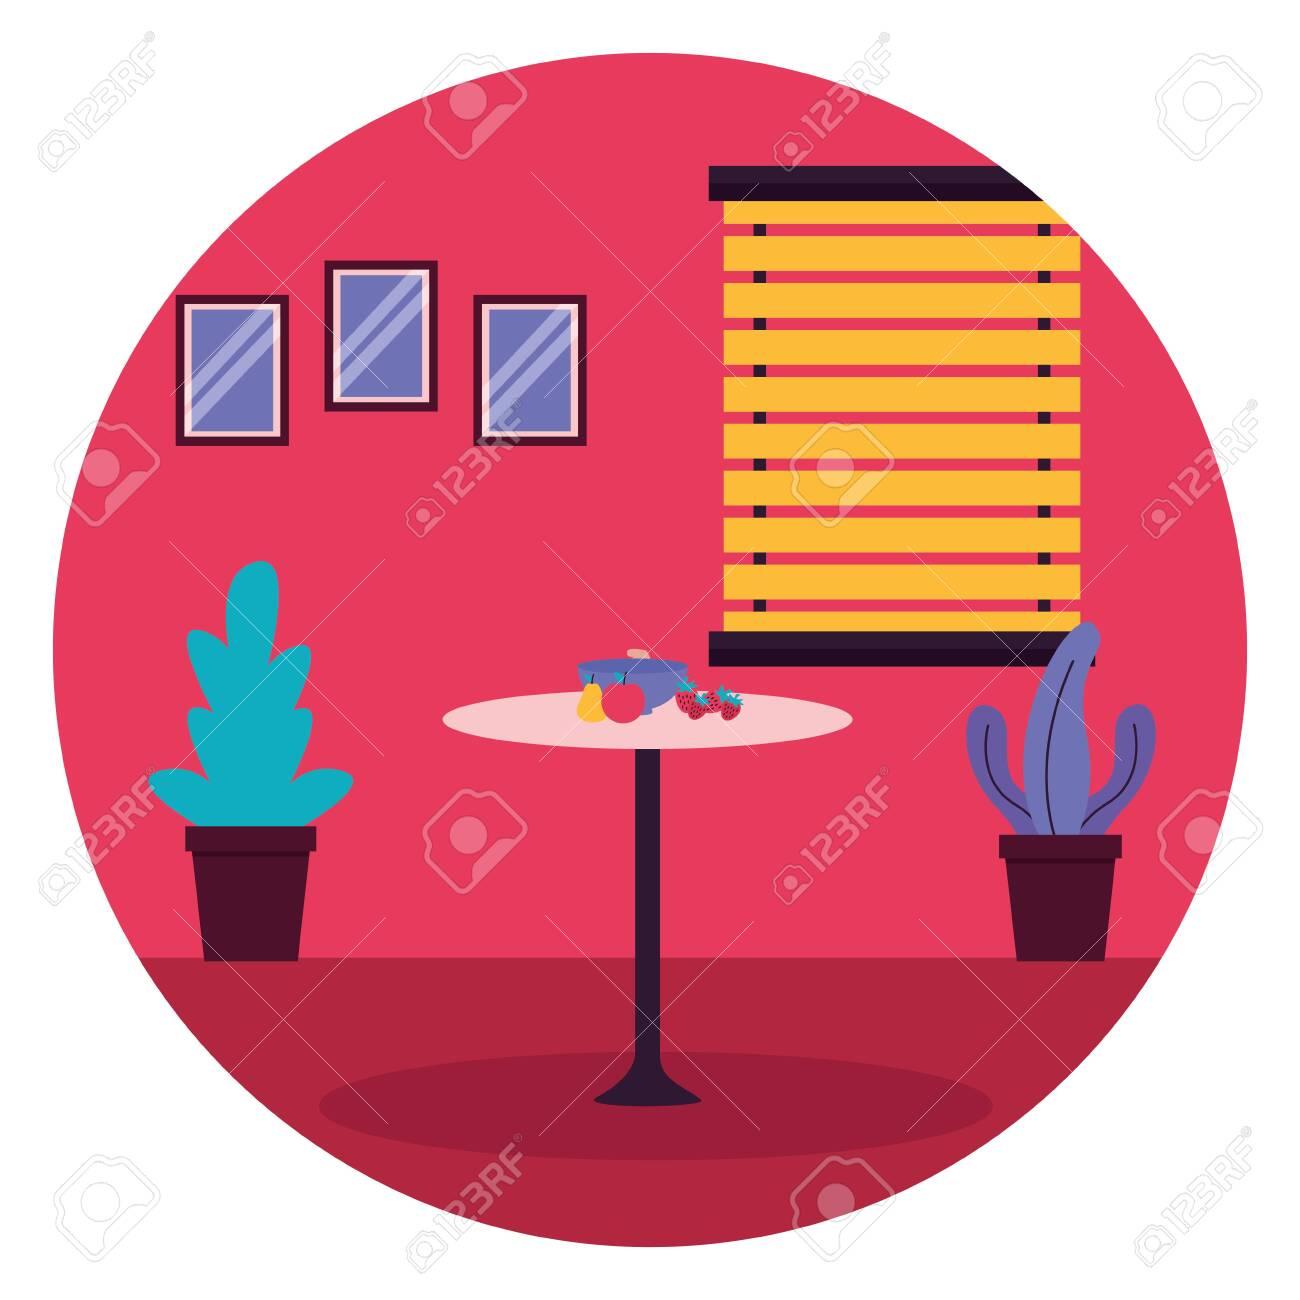 kitchen fruits table window plants furniture sticker vector illustration - 129894700